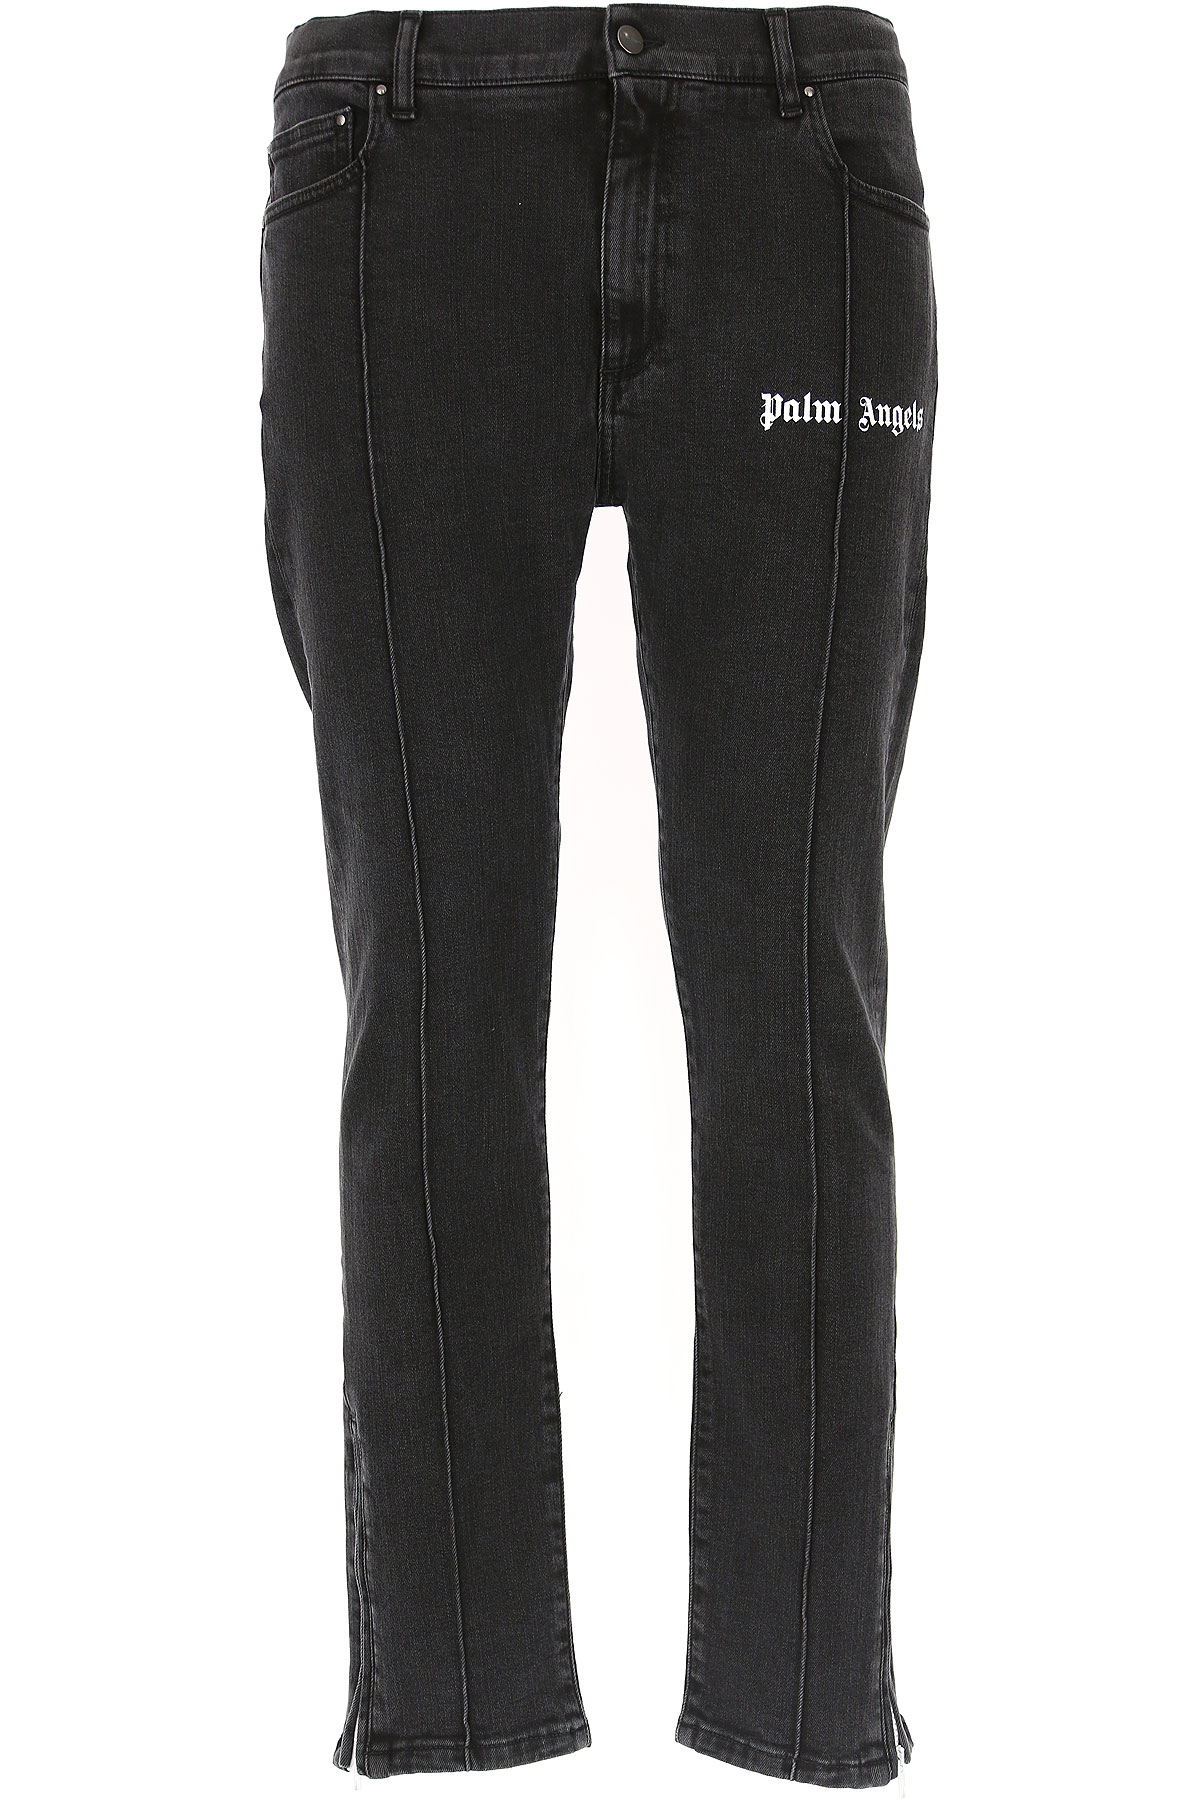 Image of Palm Angels Jeans, Denim Black, Cotton, 2017, 30 31 32 33